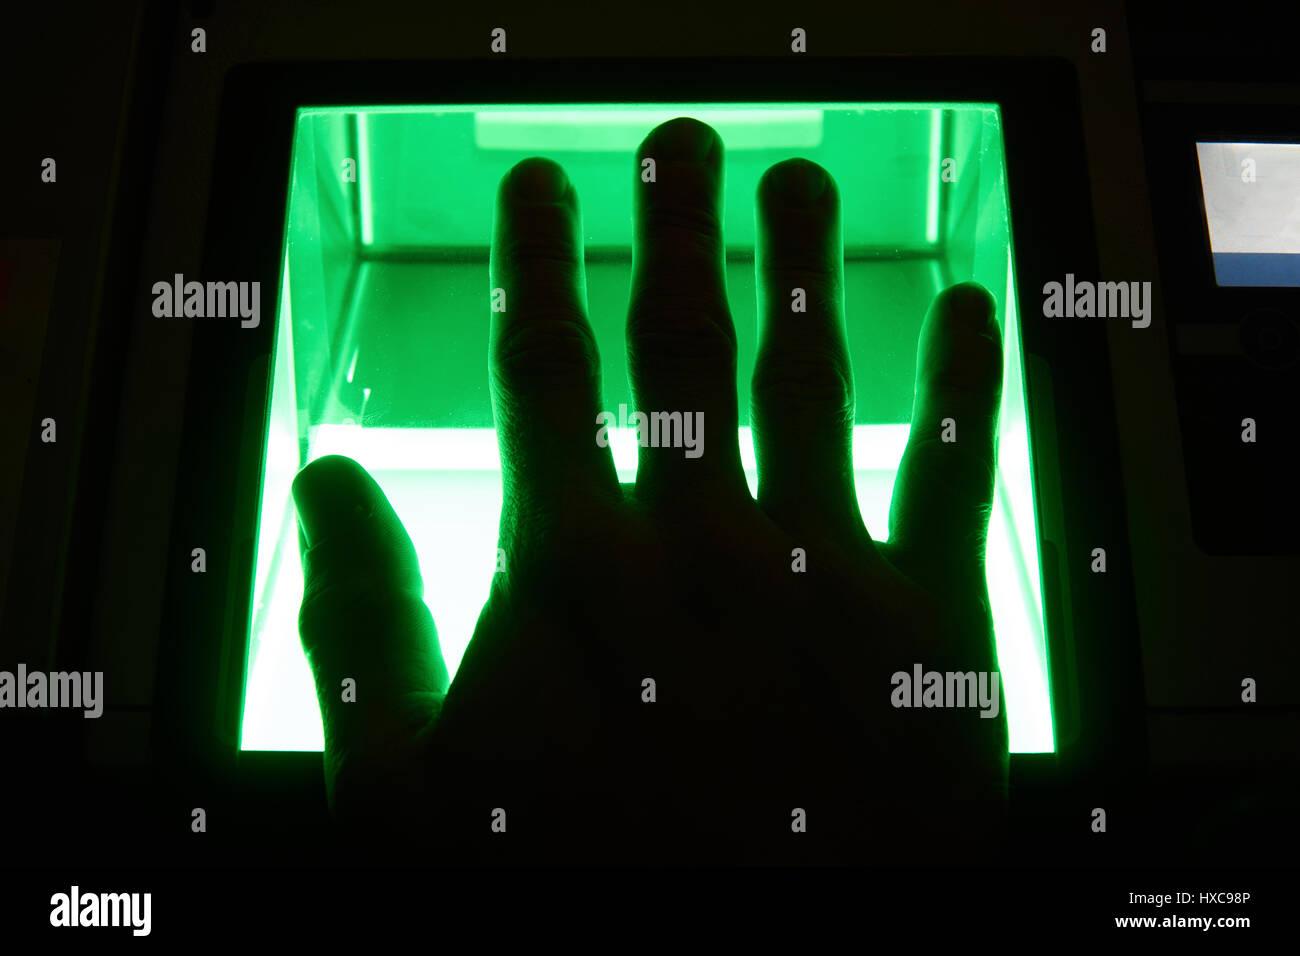 cybersecurity digital fingerprint scanning - Stock Image